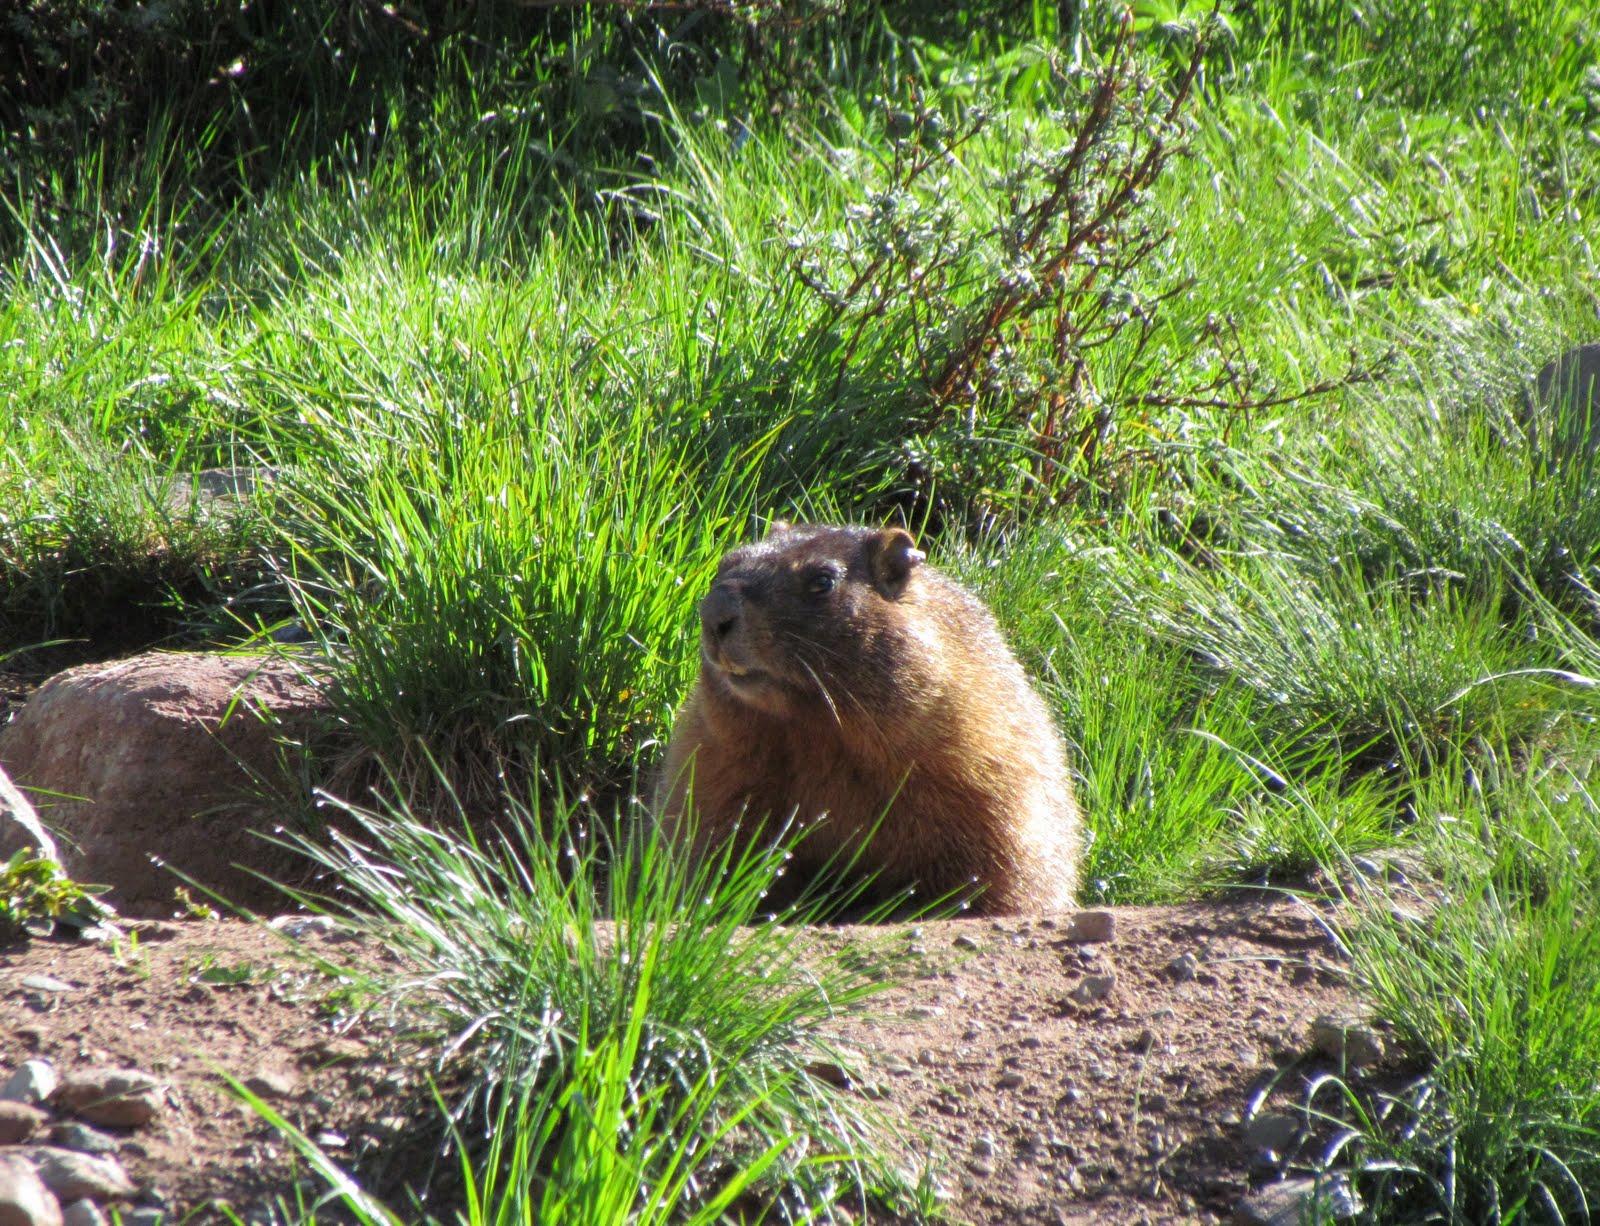 Marmot minutes: Marmot days of summer